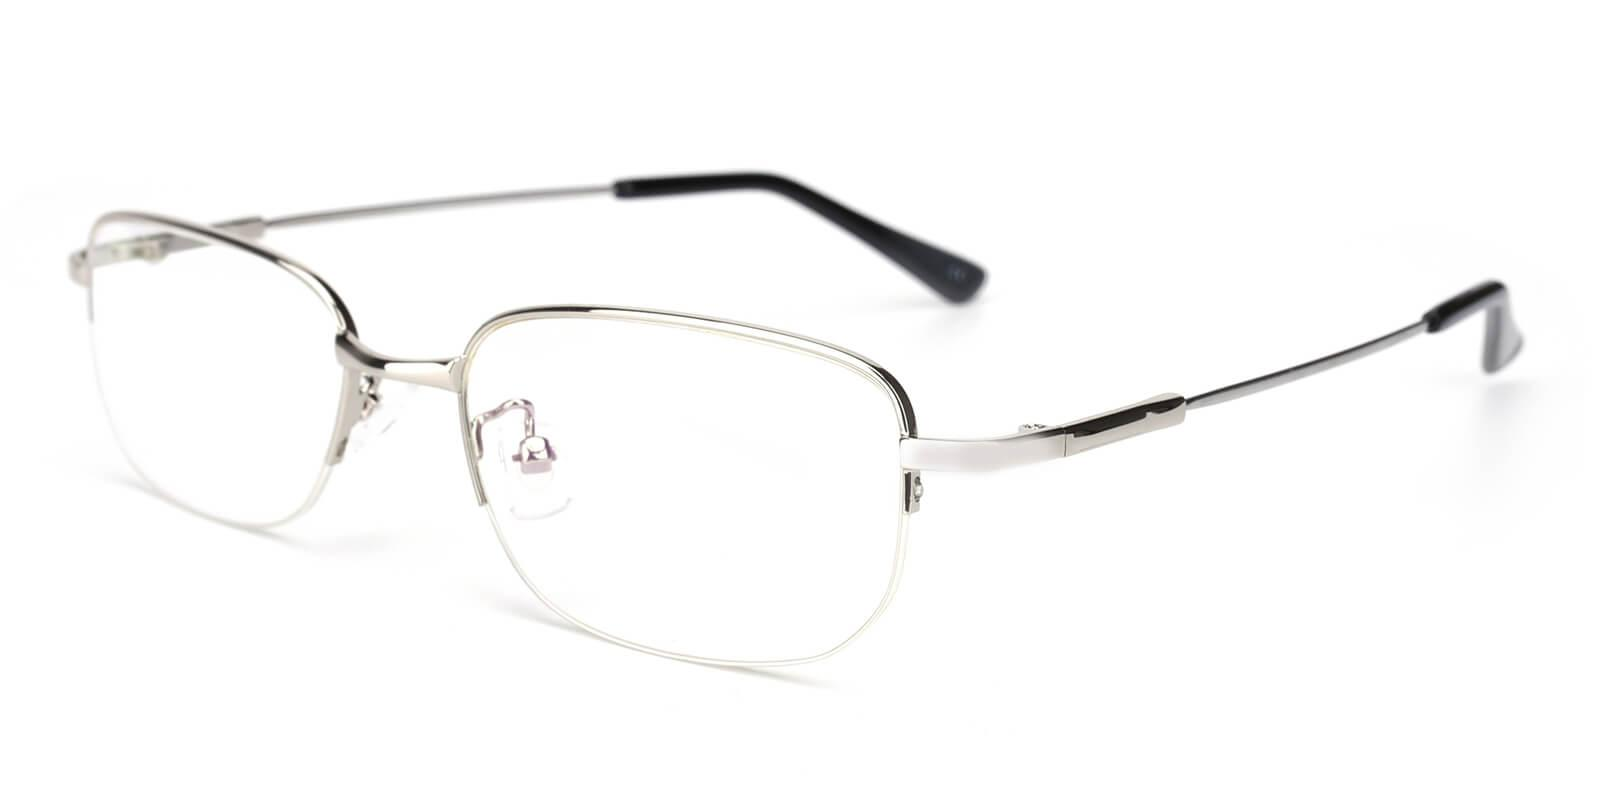 Joplin-Silver-Rectangle-Metal-Eyeglasses-additional1